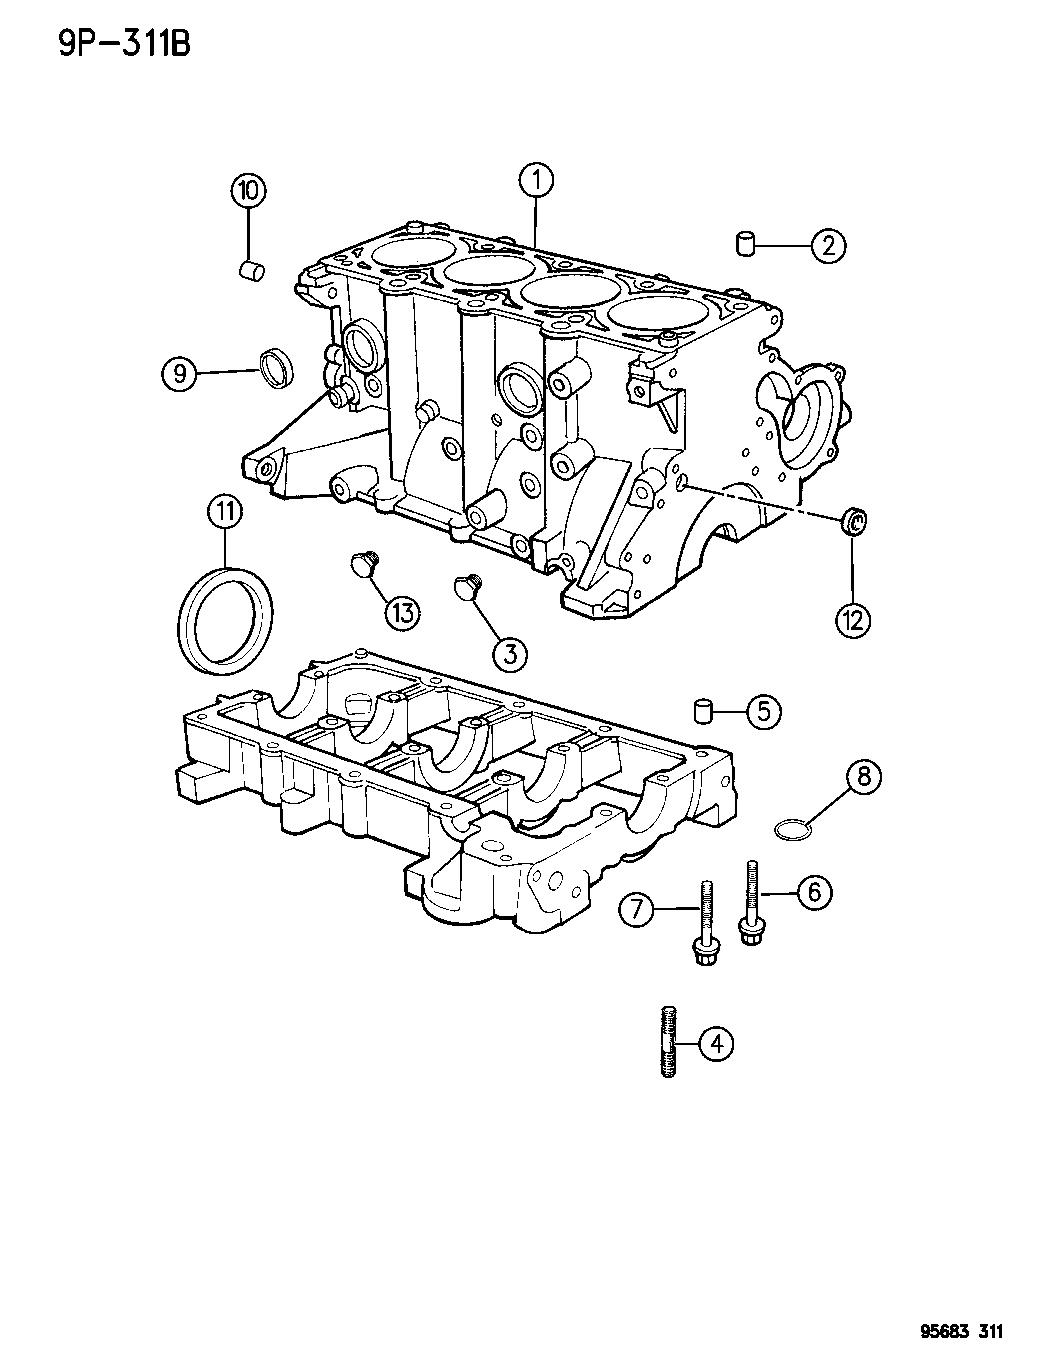 1996 Dodge Avenger Cylinder Block Mopar Parts Giant Engine Diagram Thumbnail 2